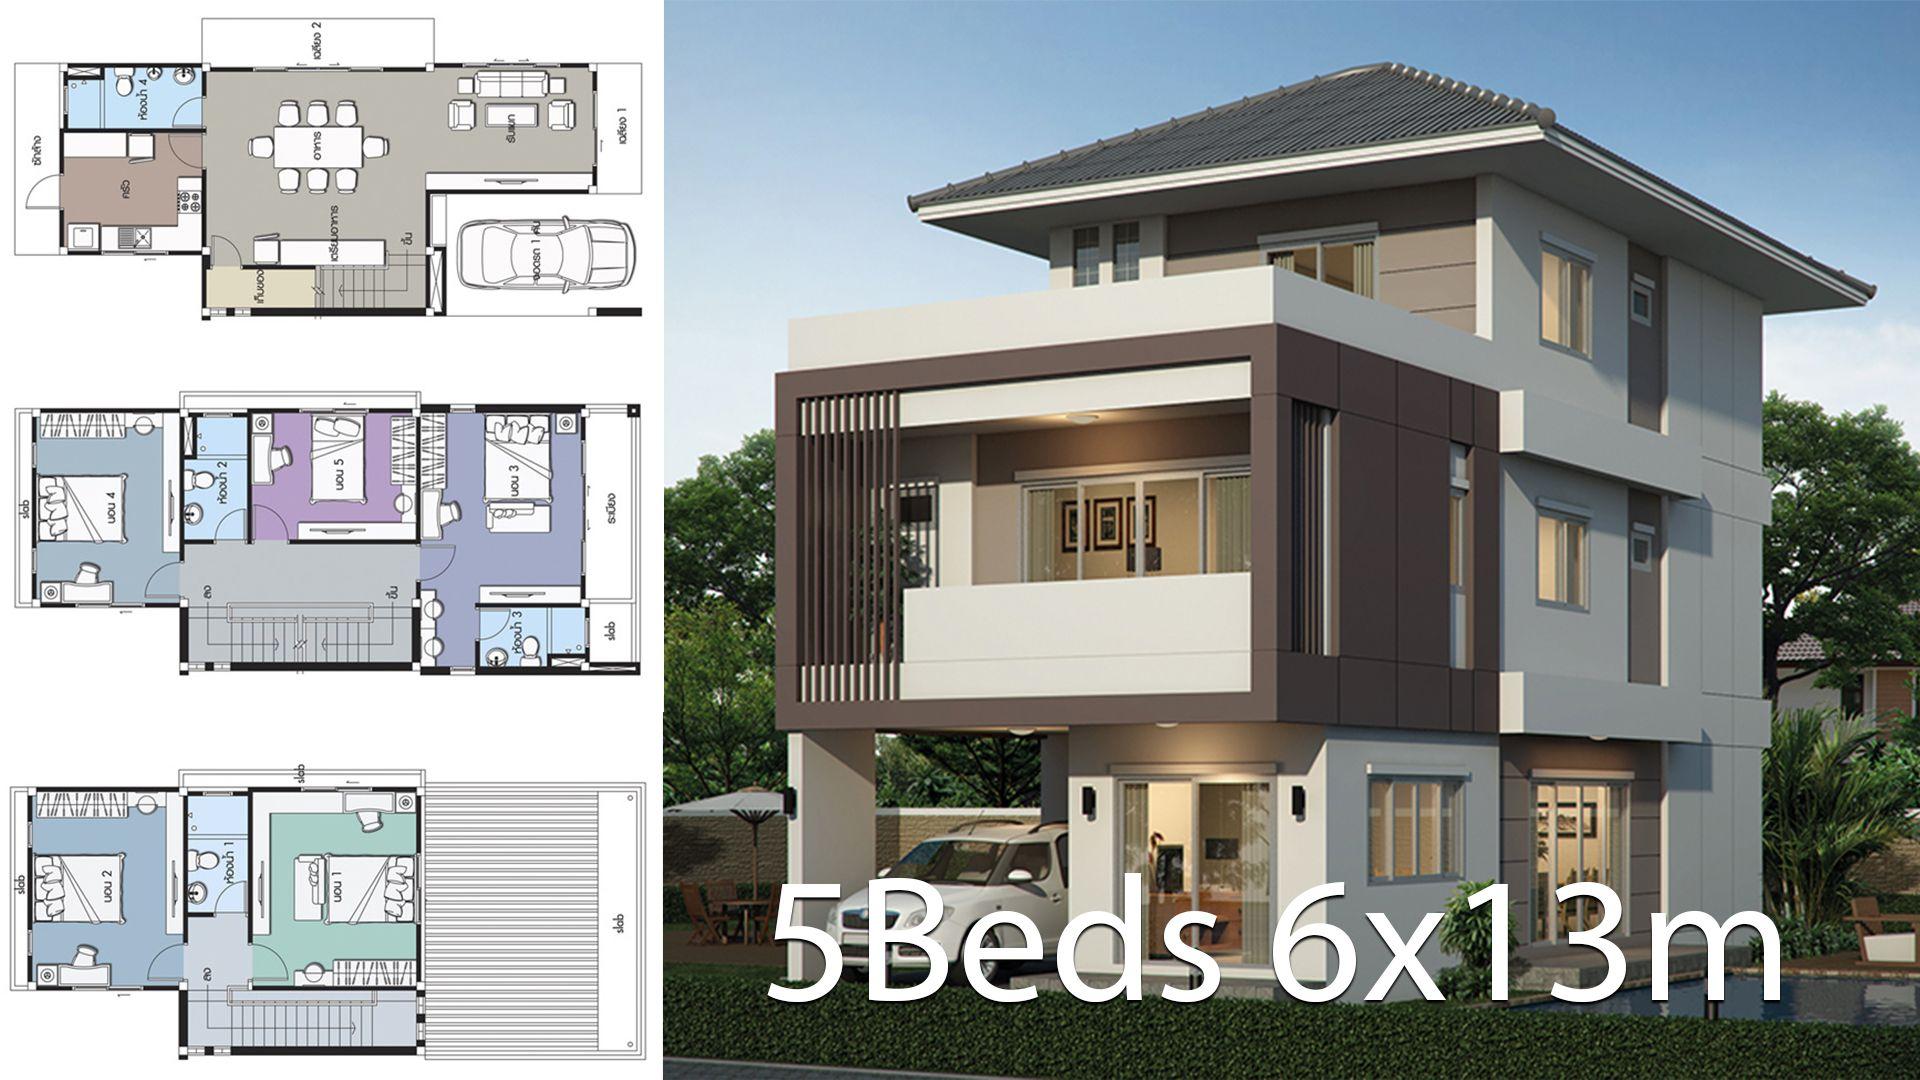 Home Design Plan 6x13m With 5 Bedrooms Style Modernhouse Description Number Of Floors 3 Storey Housebedroom In 2020 Home Design Plan Duplex House Design House Design